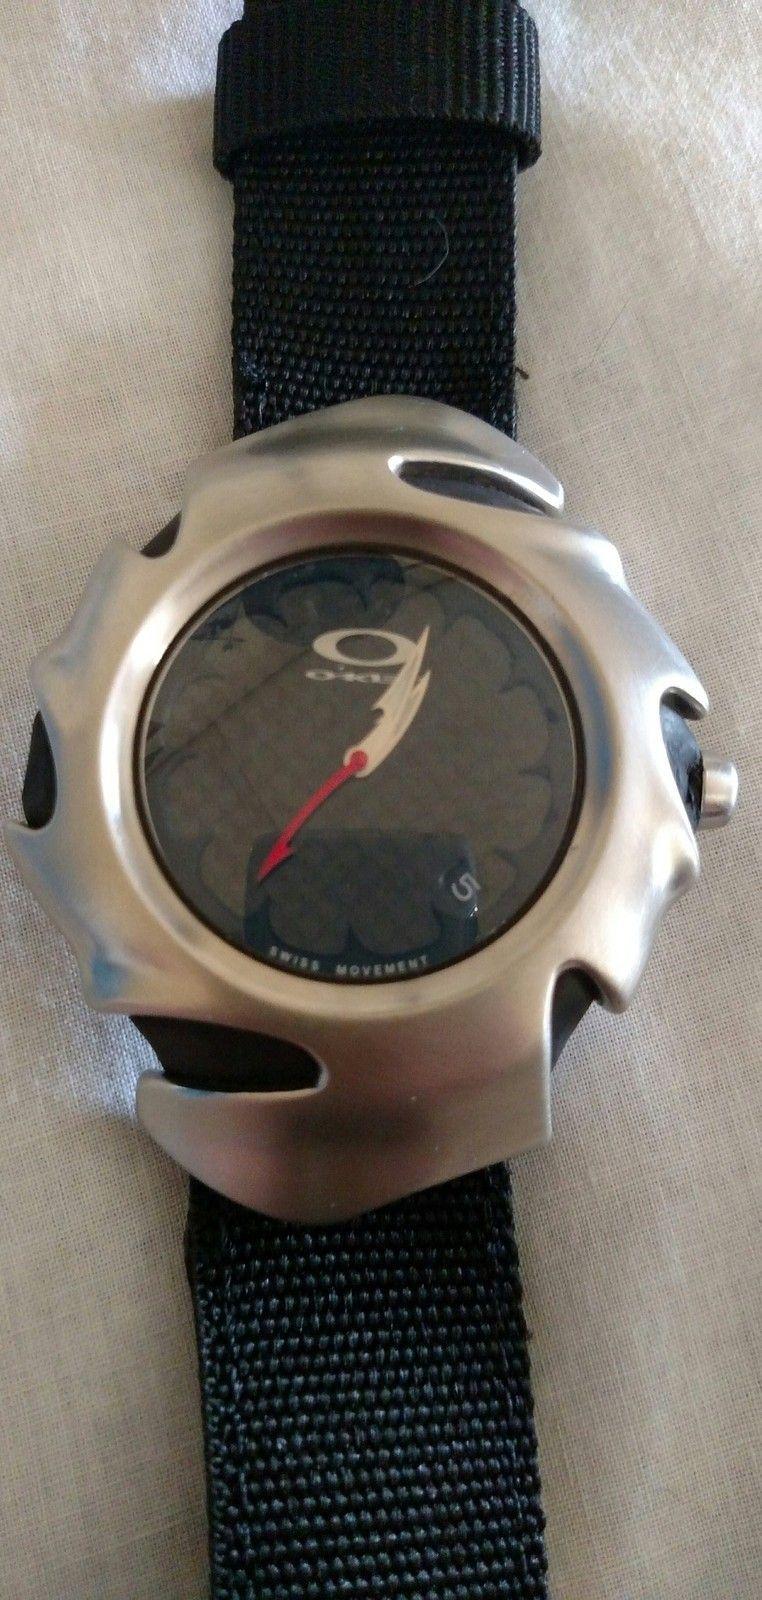 Blade Watch (PRICE DROP) - uploadfromtaptalk1428254372006.jpg